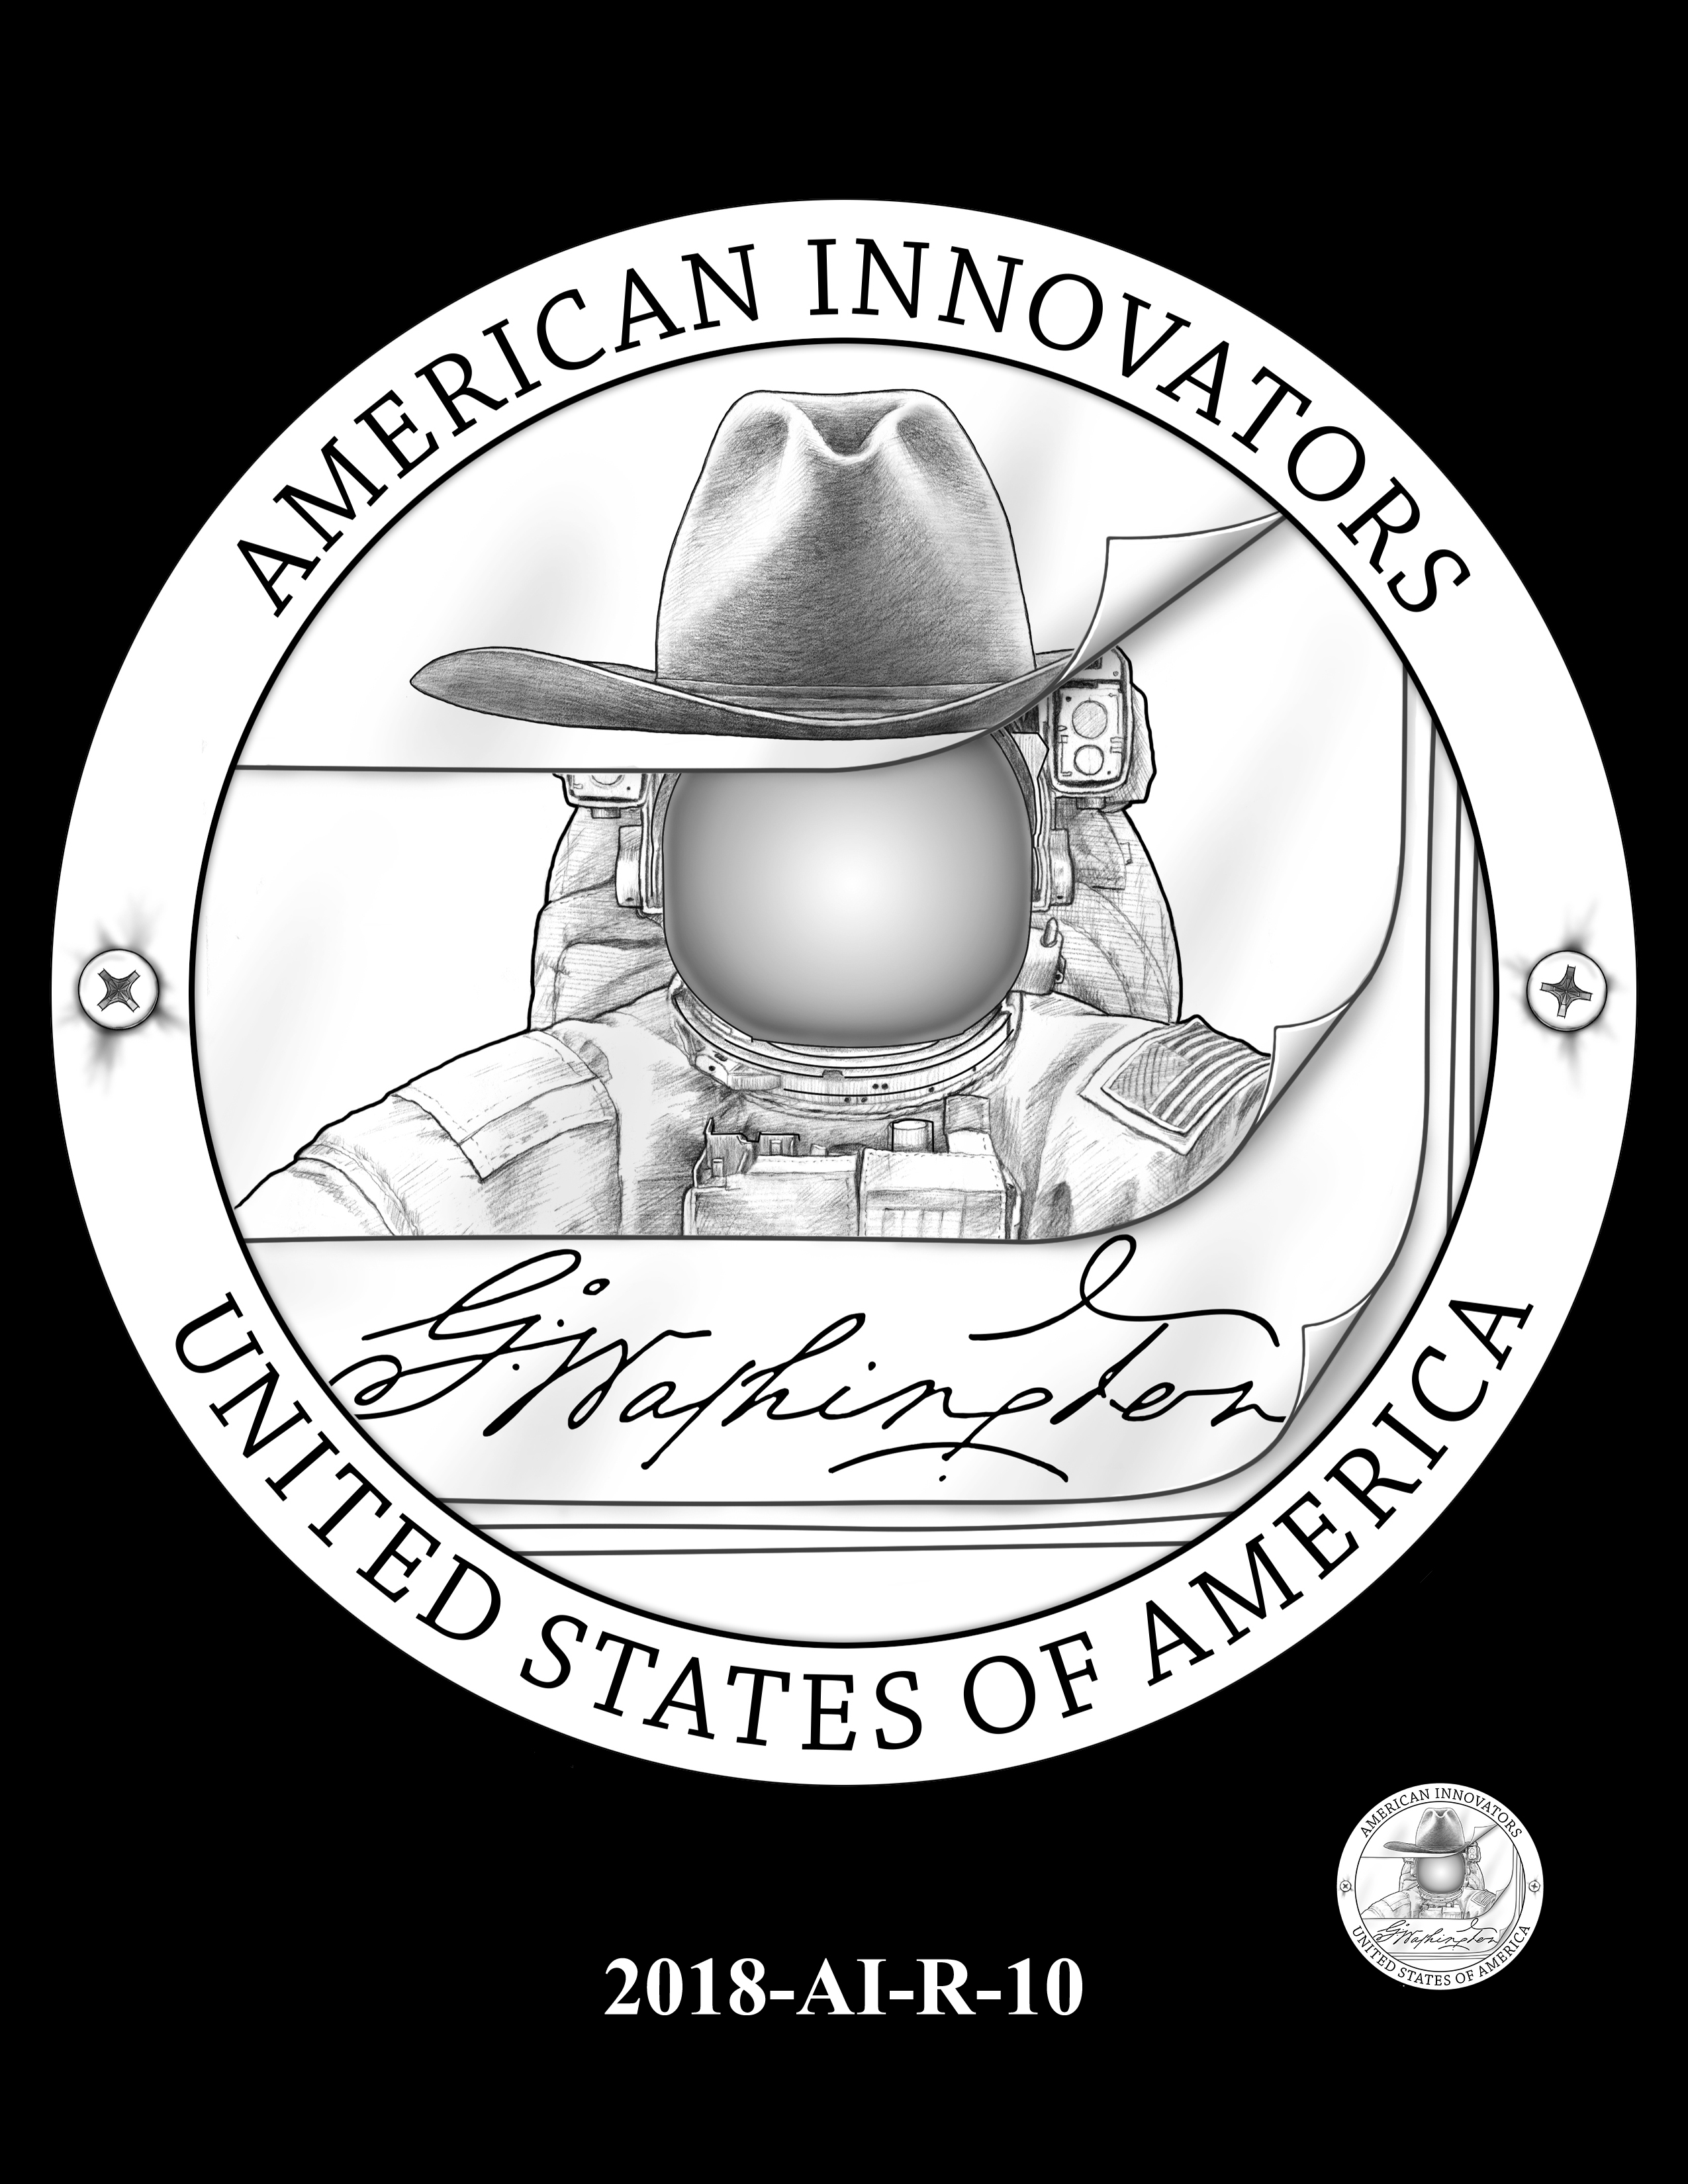 2018-AI-R-10 -- 2018 American Innovation $1 Coin